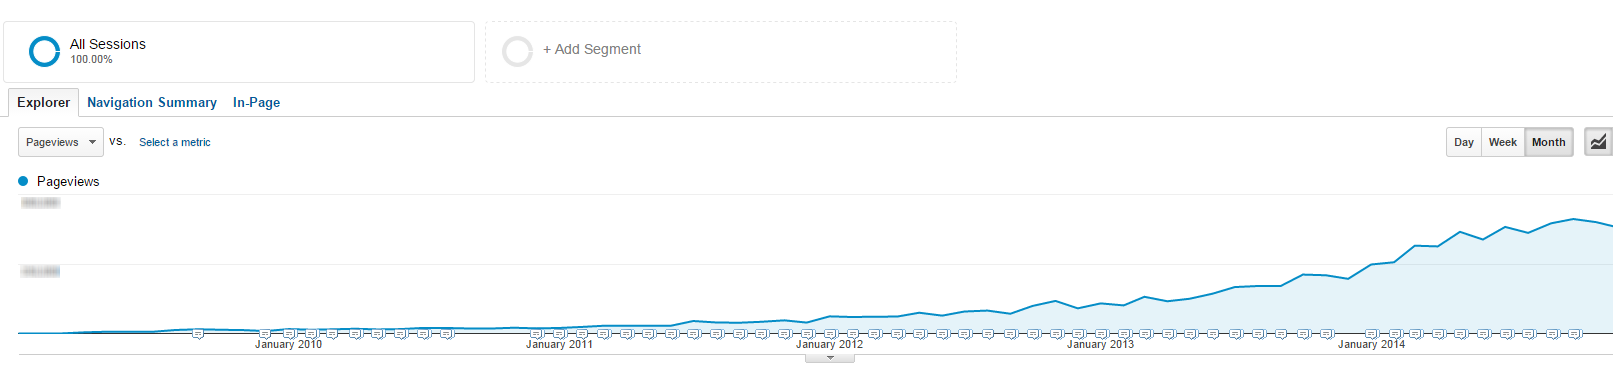 Thought leadership marketing WordStream blog traffic